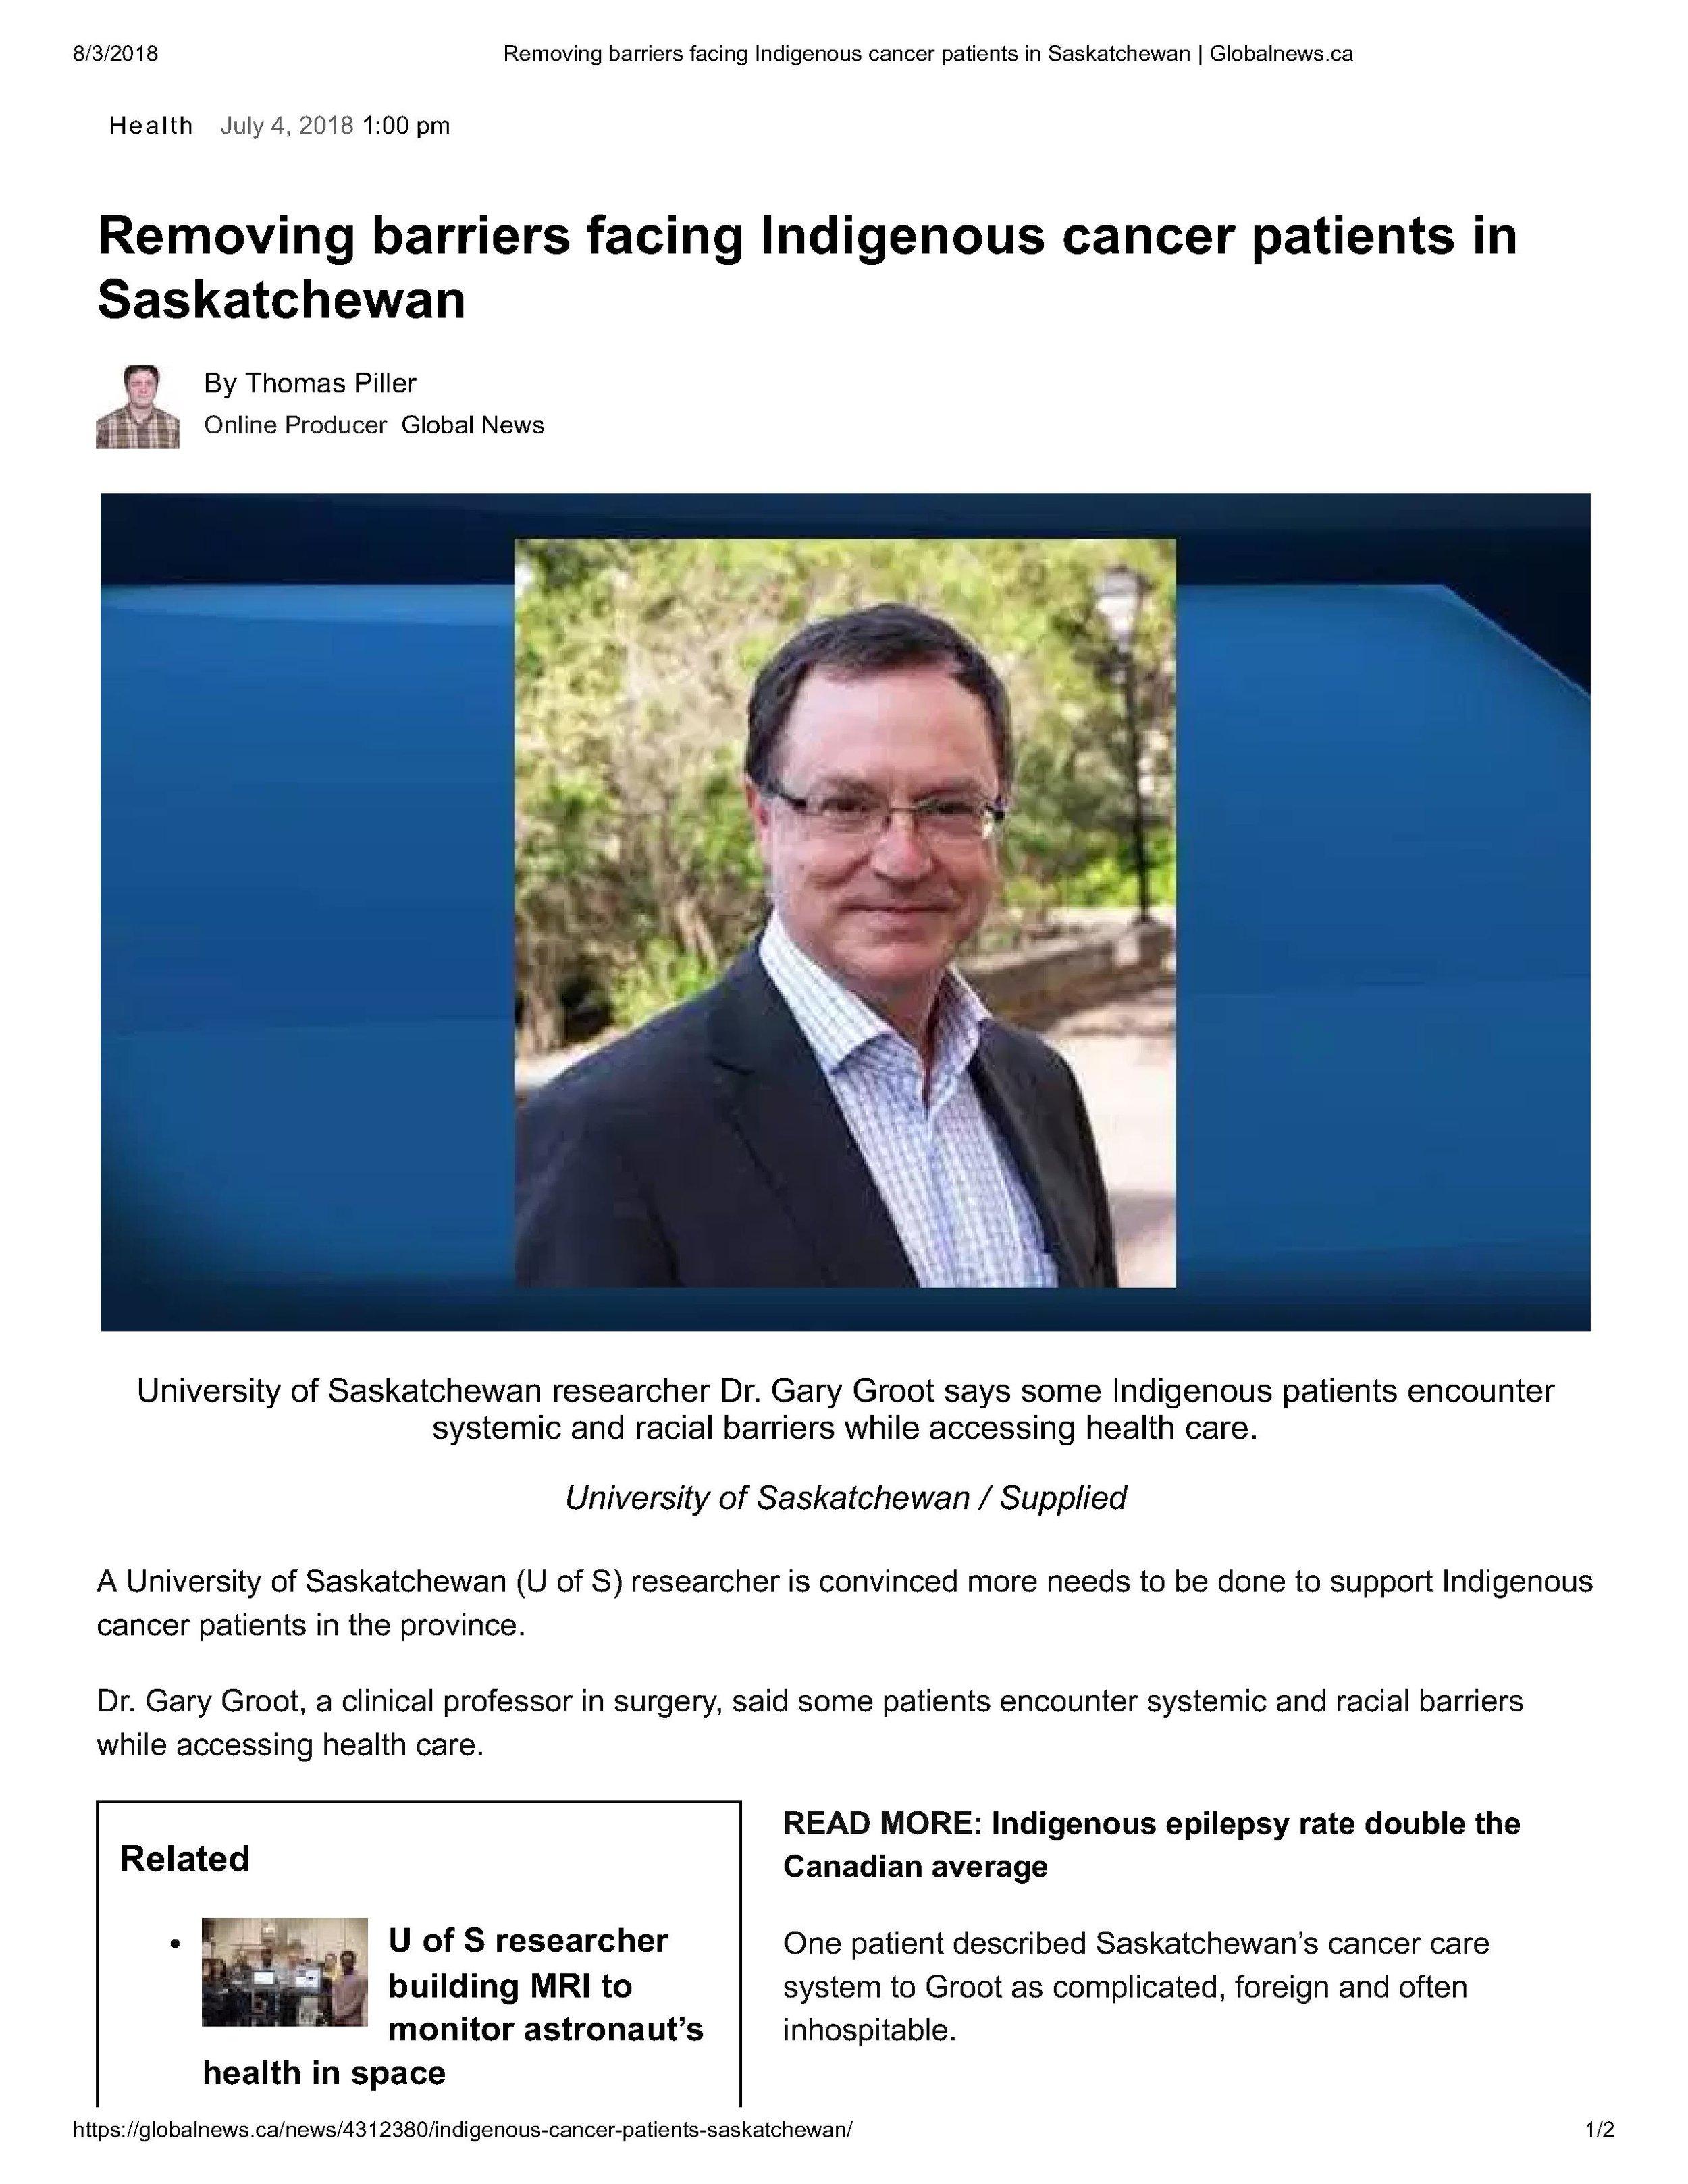 5 Indigenous cancer patients Globalnews.ca_1.jpg